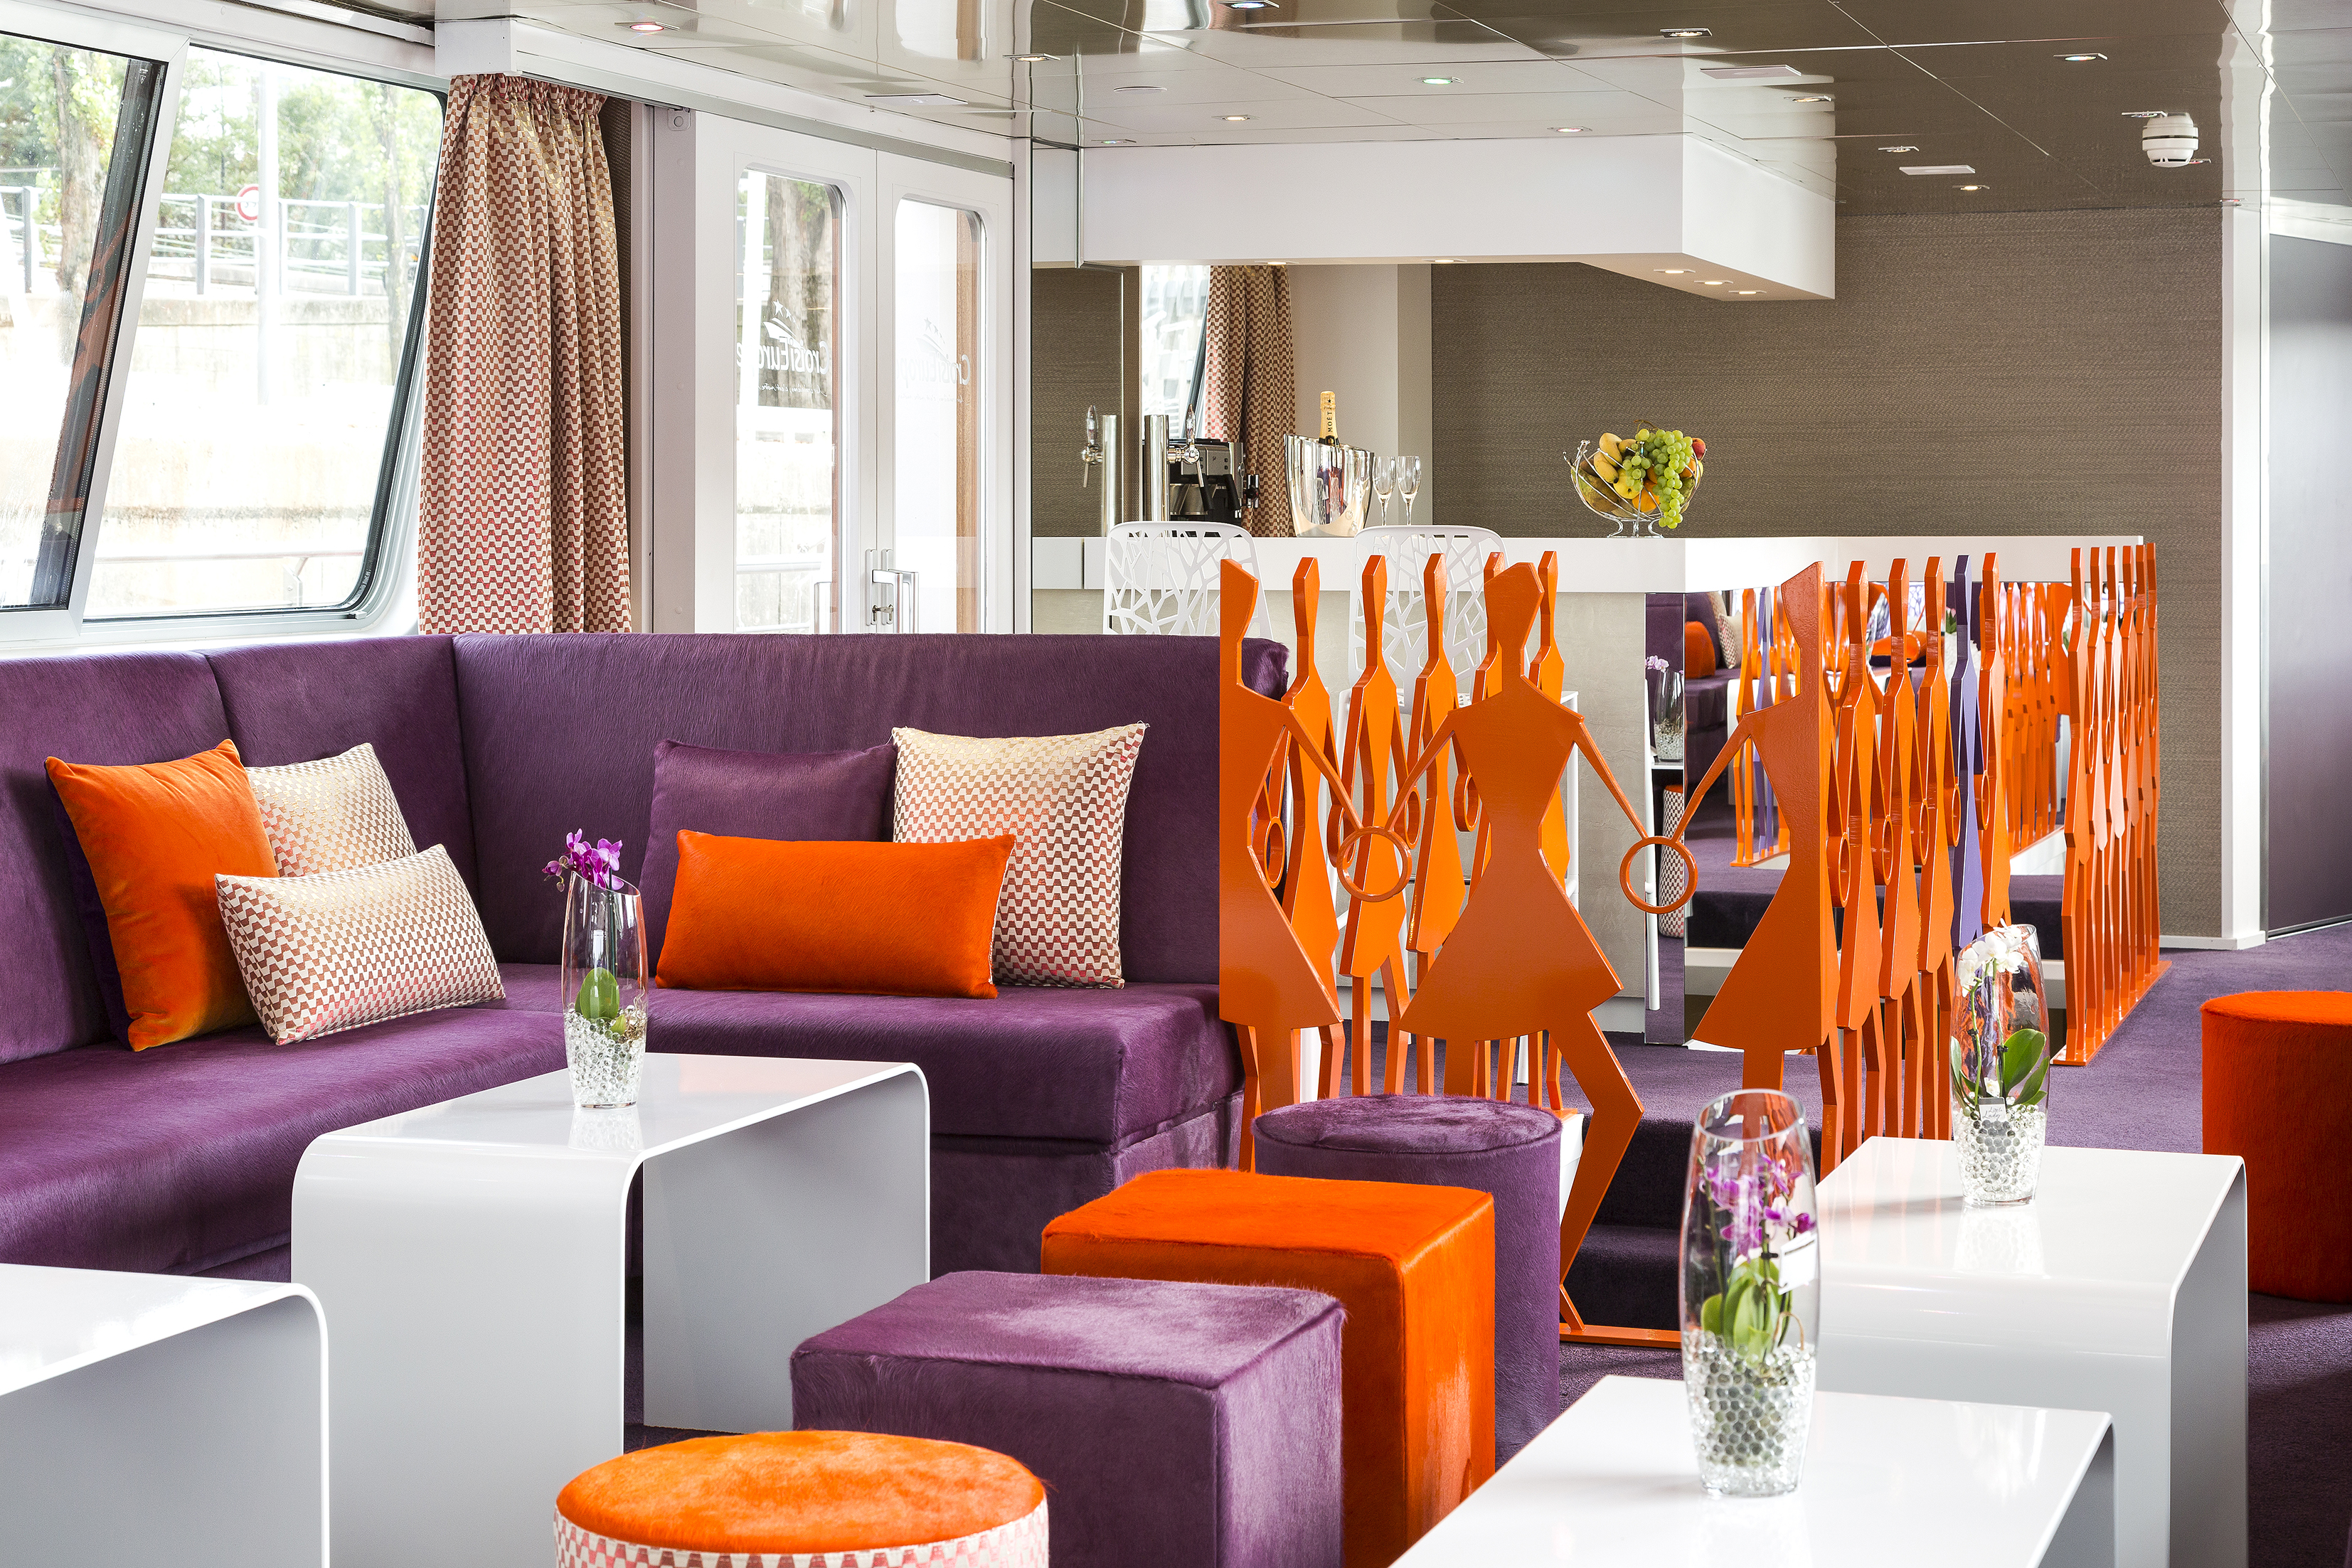 CroisiEurope MS Raymonde Interior Lounge Bar 4.jpg